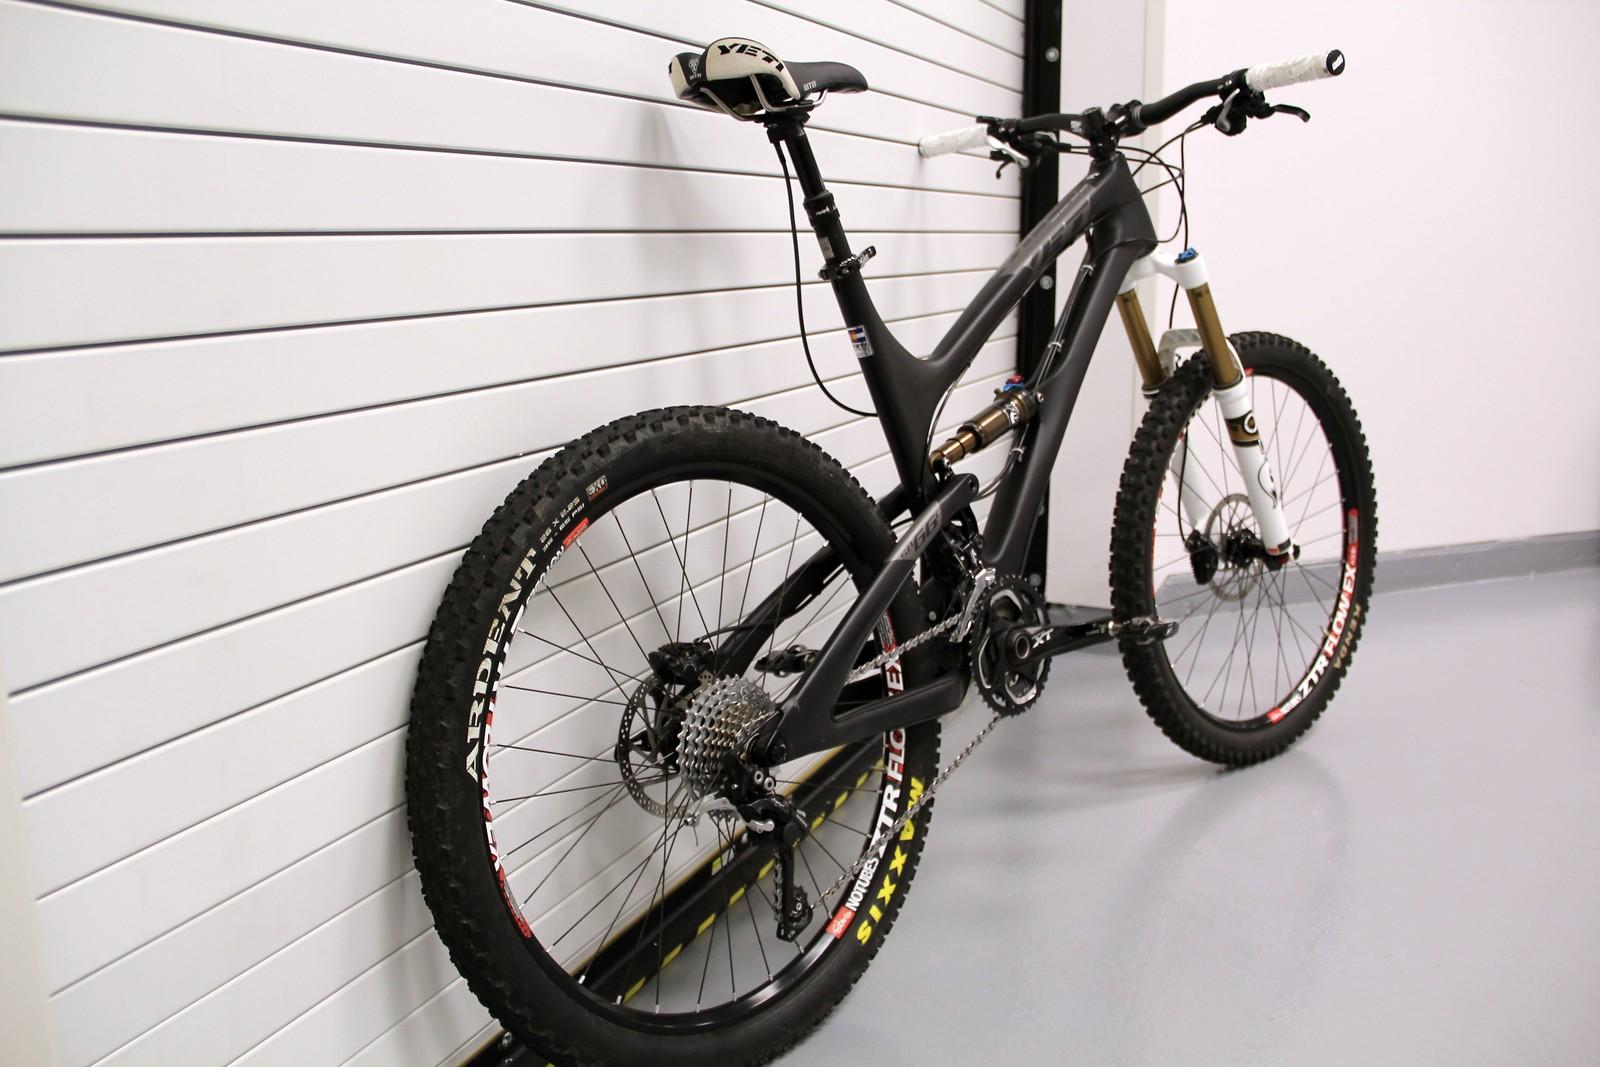 2013 Yeti SB-66 C - dBissett\'s Bike Check - Vital MTB